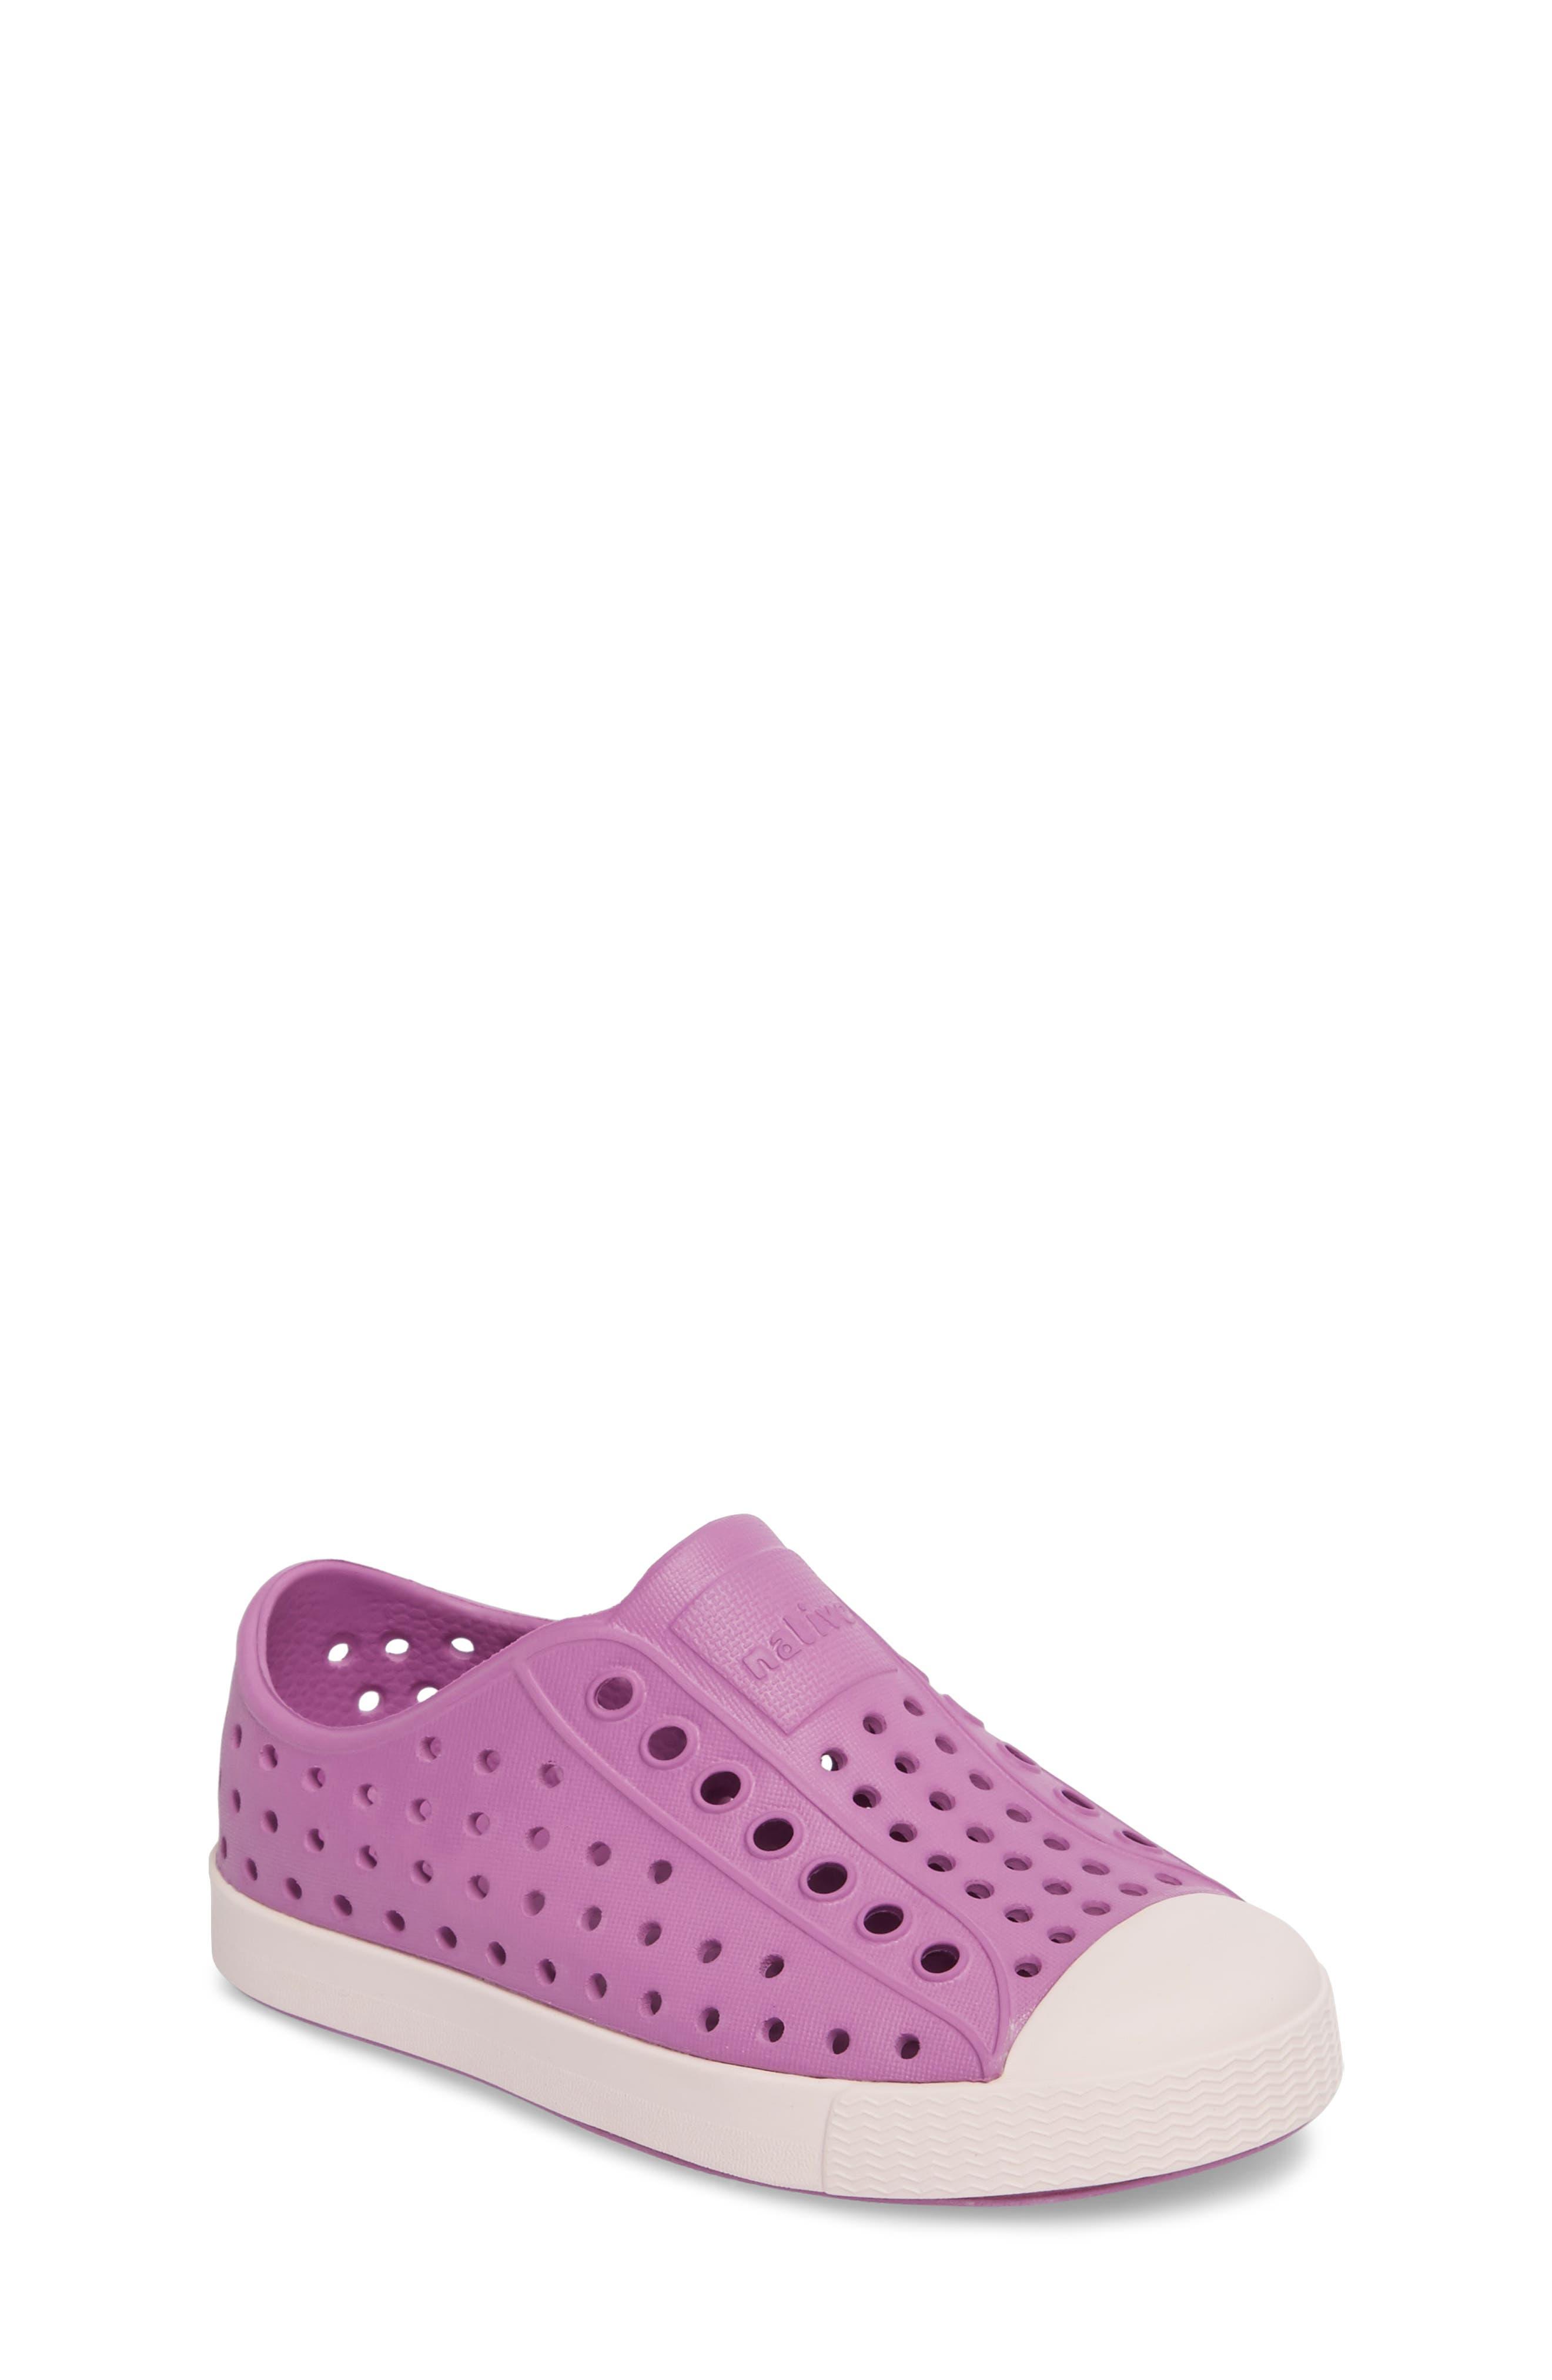 'Jefferson' Water Friendly Slip-On Sneaker,                             Alternate thumbnail 107, color,